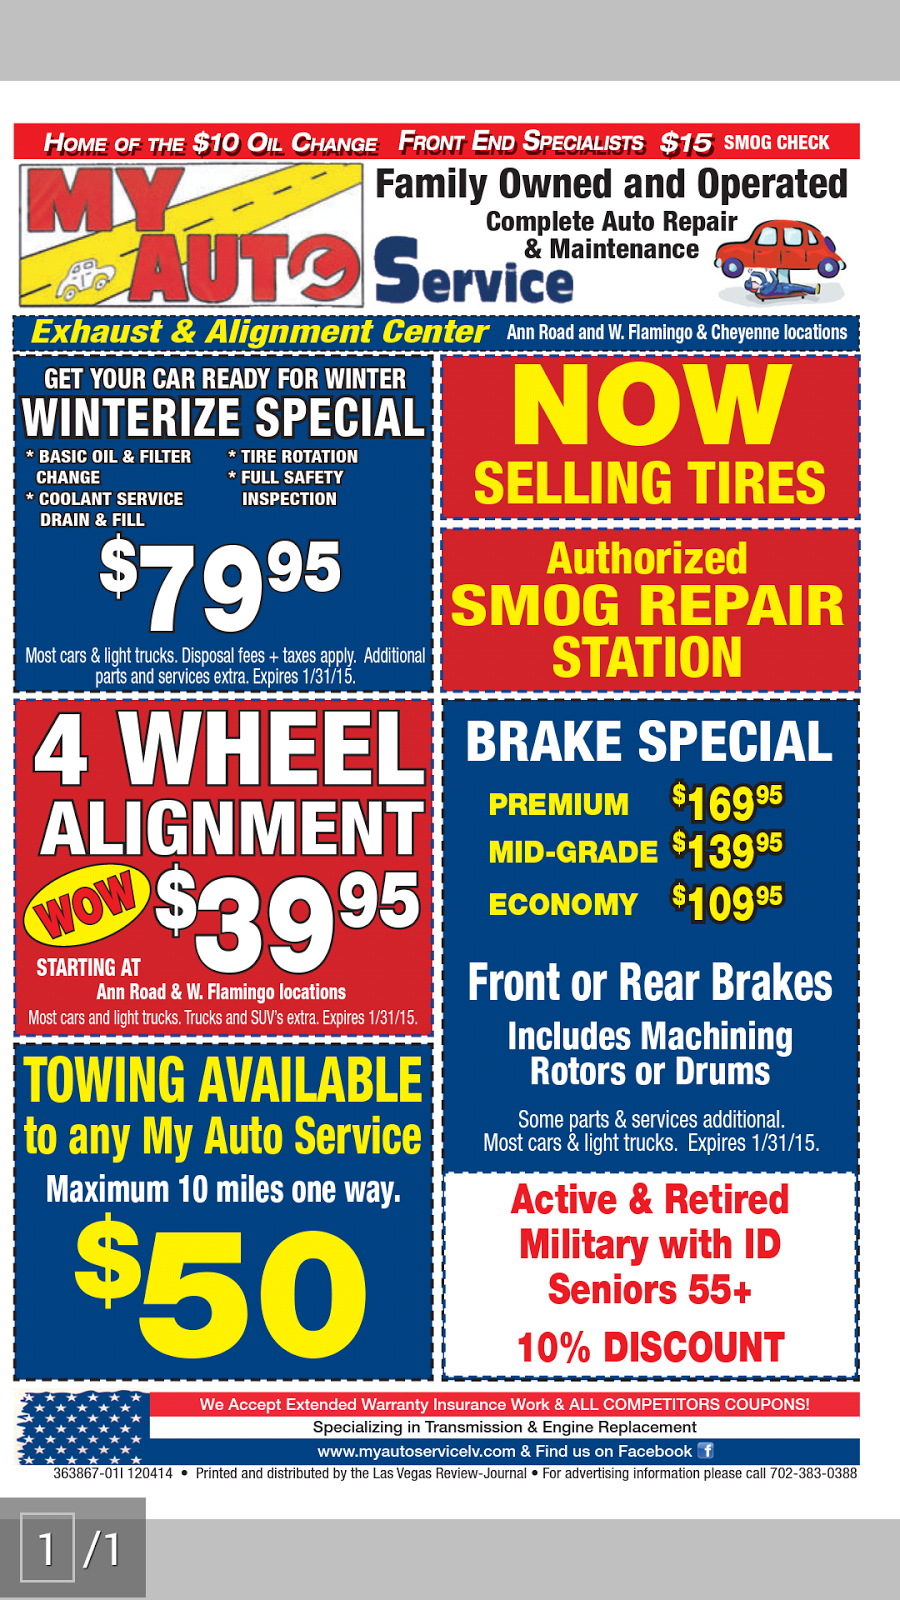 My Auto Service 2 - car repair  | Photo 2 of 3 | Address: 6104 W Cheyenne Ave, Las Vegas, NV 89108, USA | Phone: (702) 228-5432